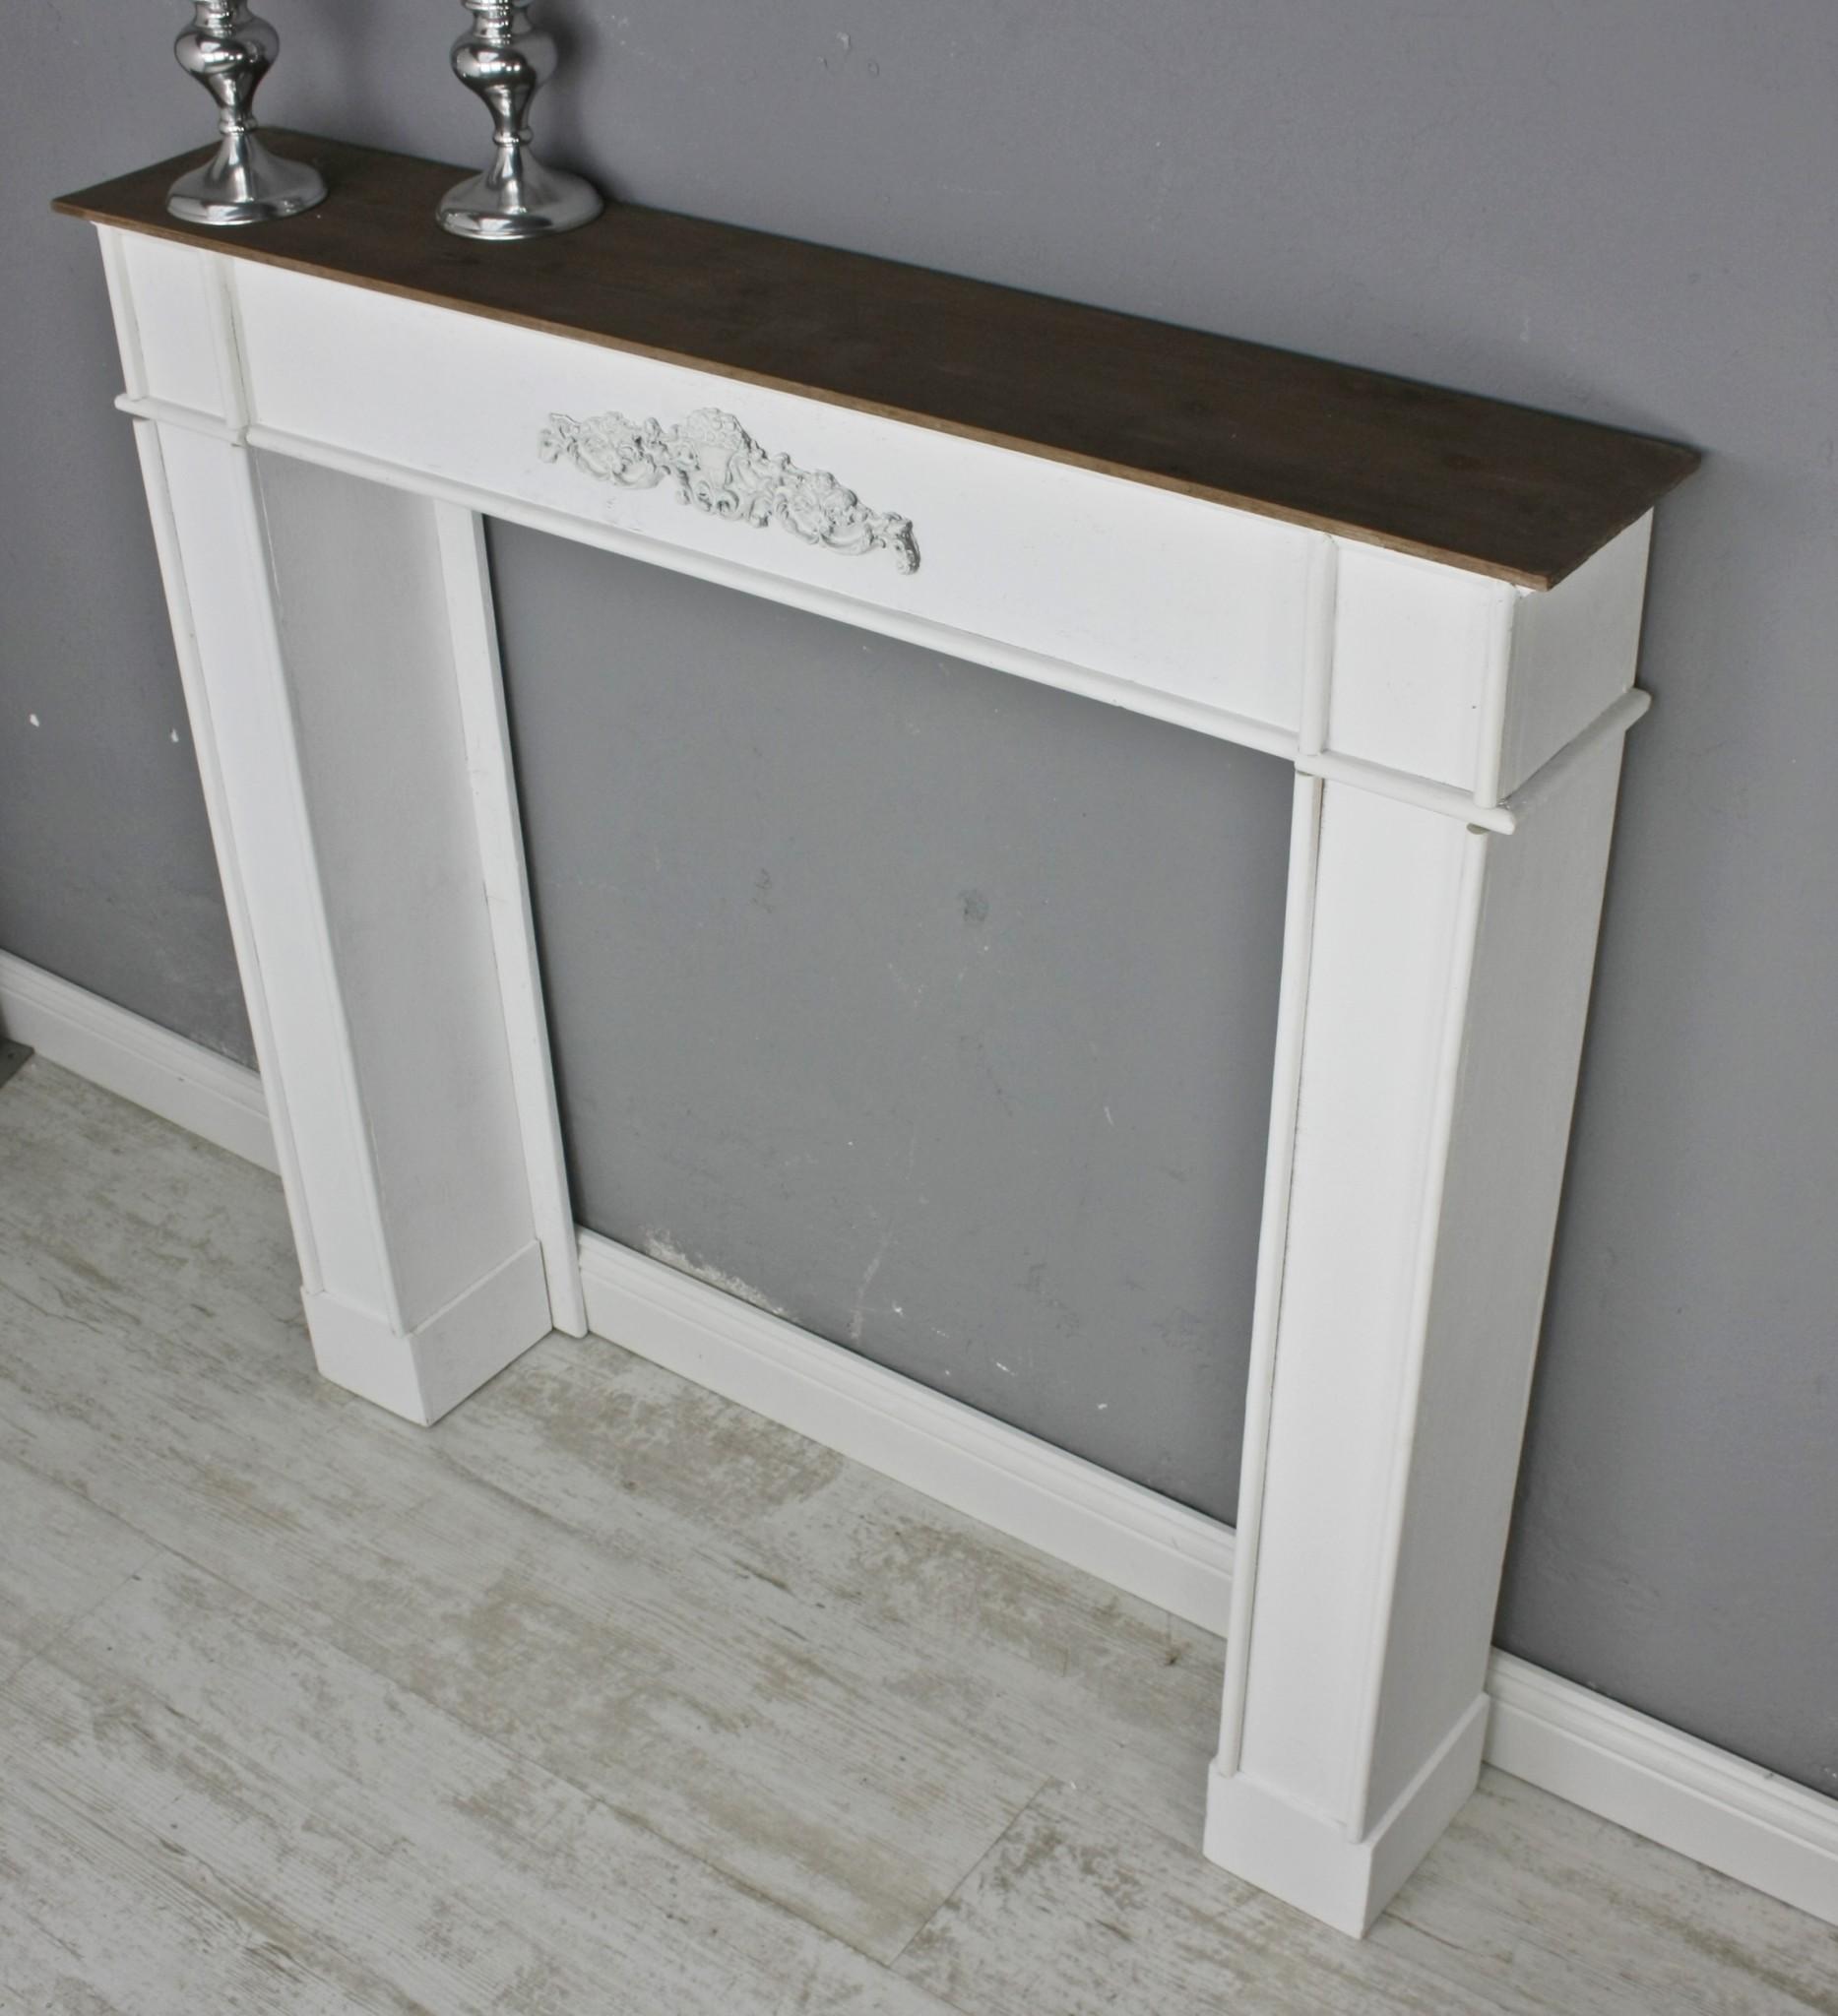 kaminumrandung kaminumbau kaminkonsole mdf wei braun f r. Black Bedroom Furniture Sets. Home Design Ideas